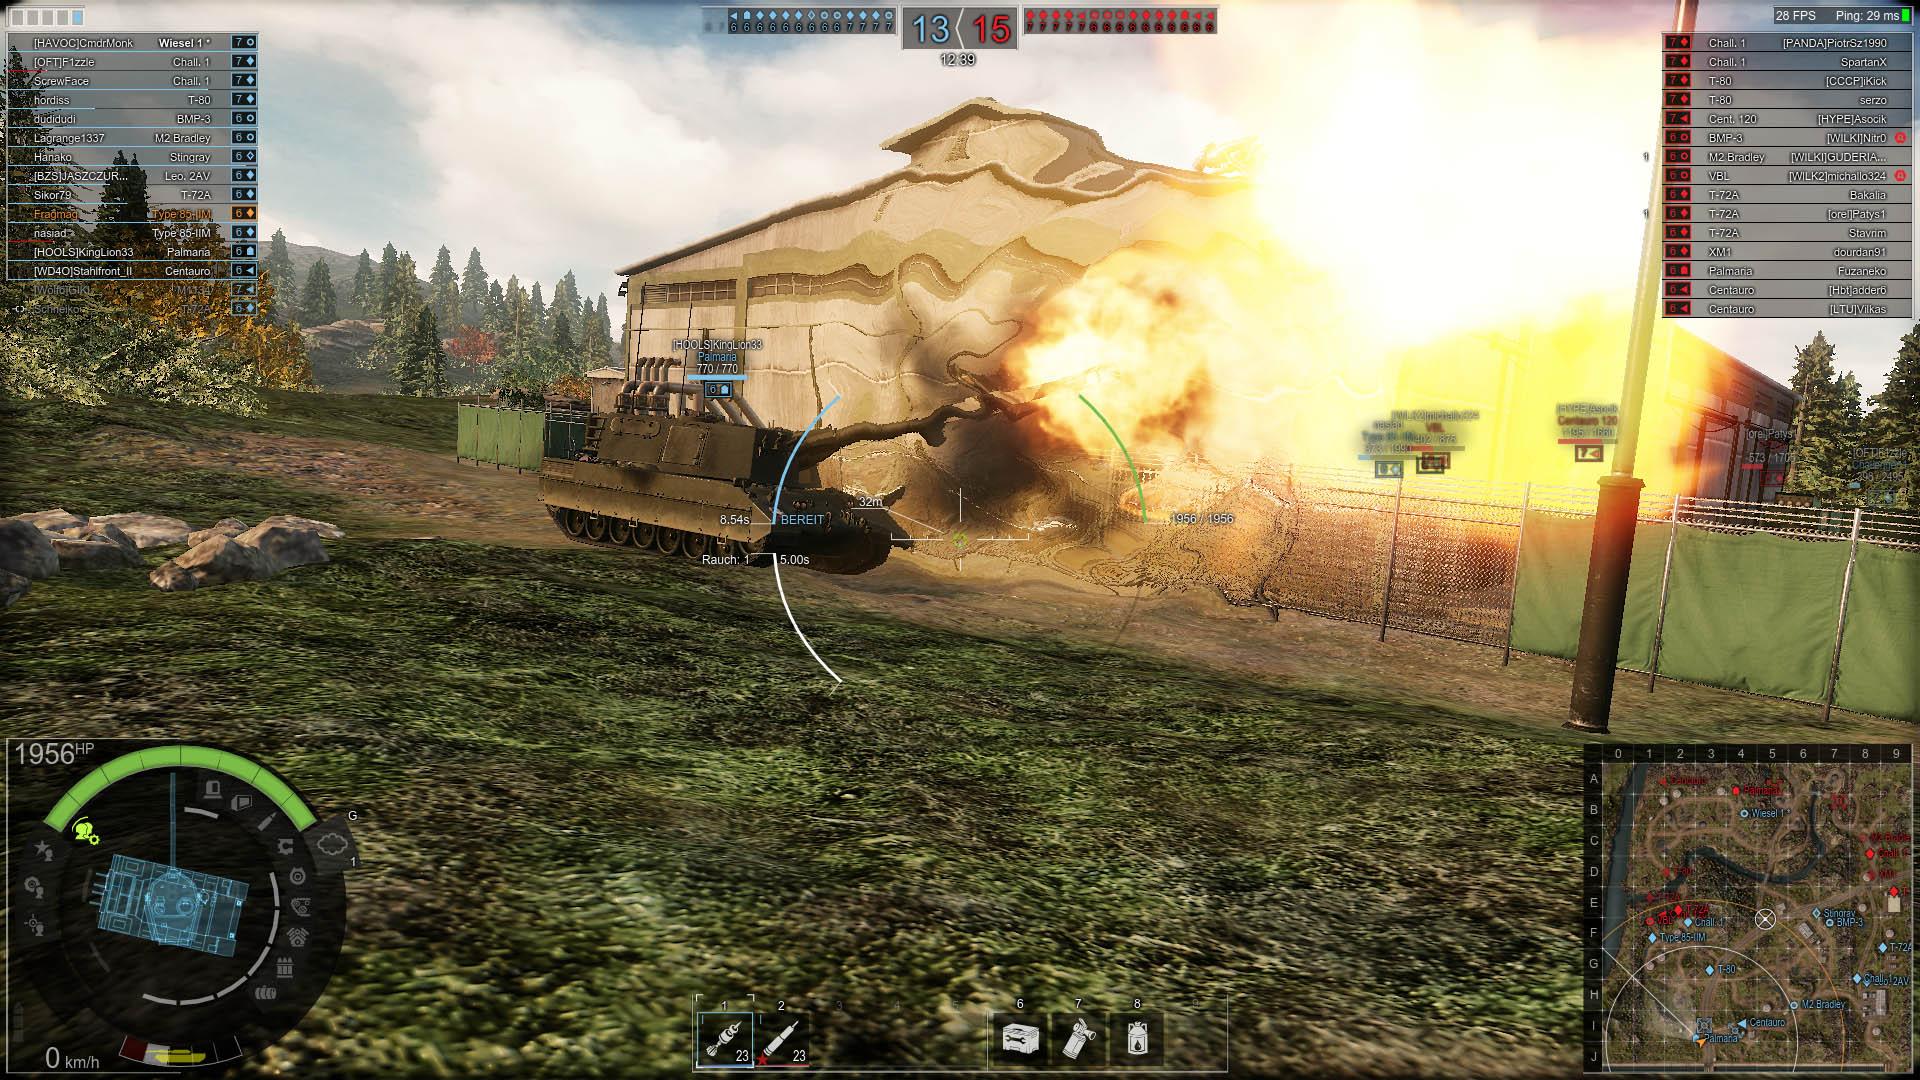 armoredwarfare 2016-03-26 19-48-04-39